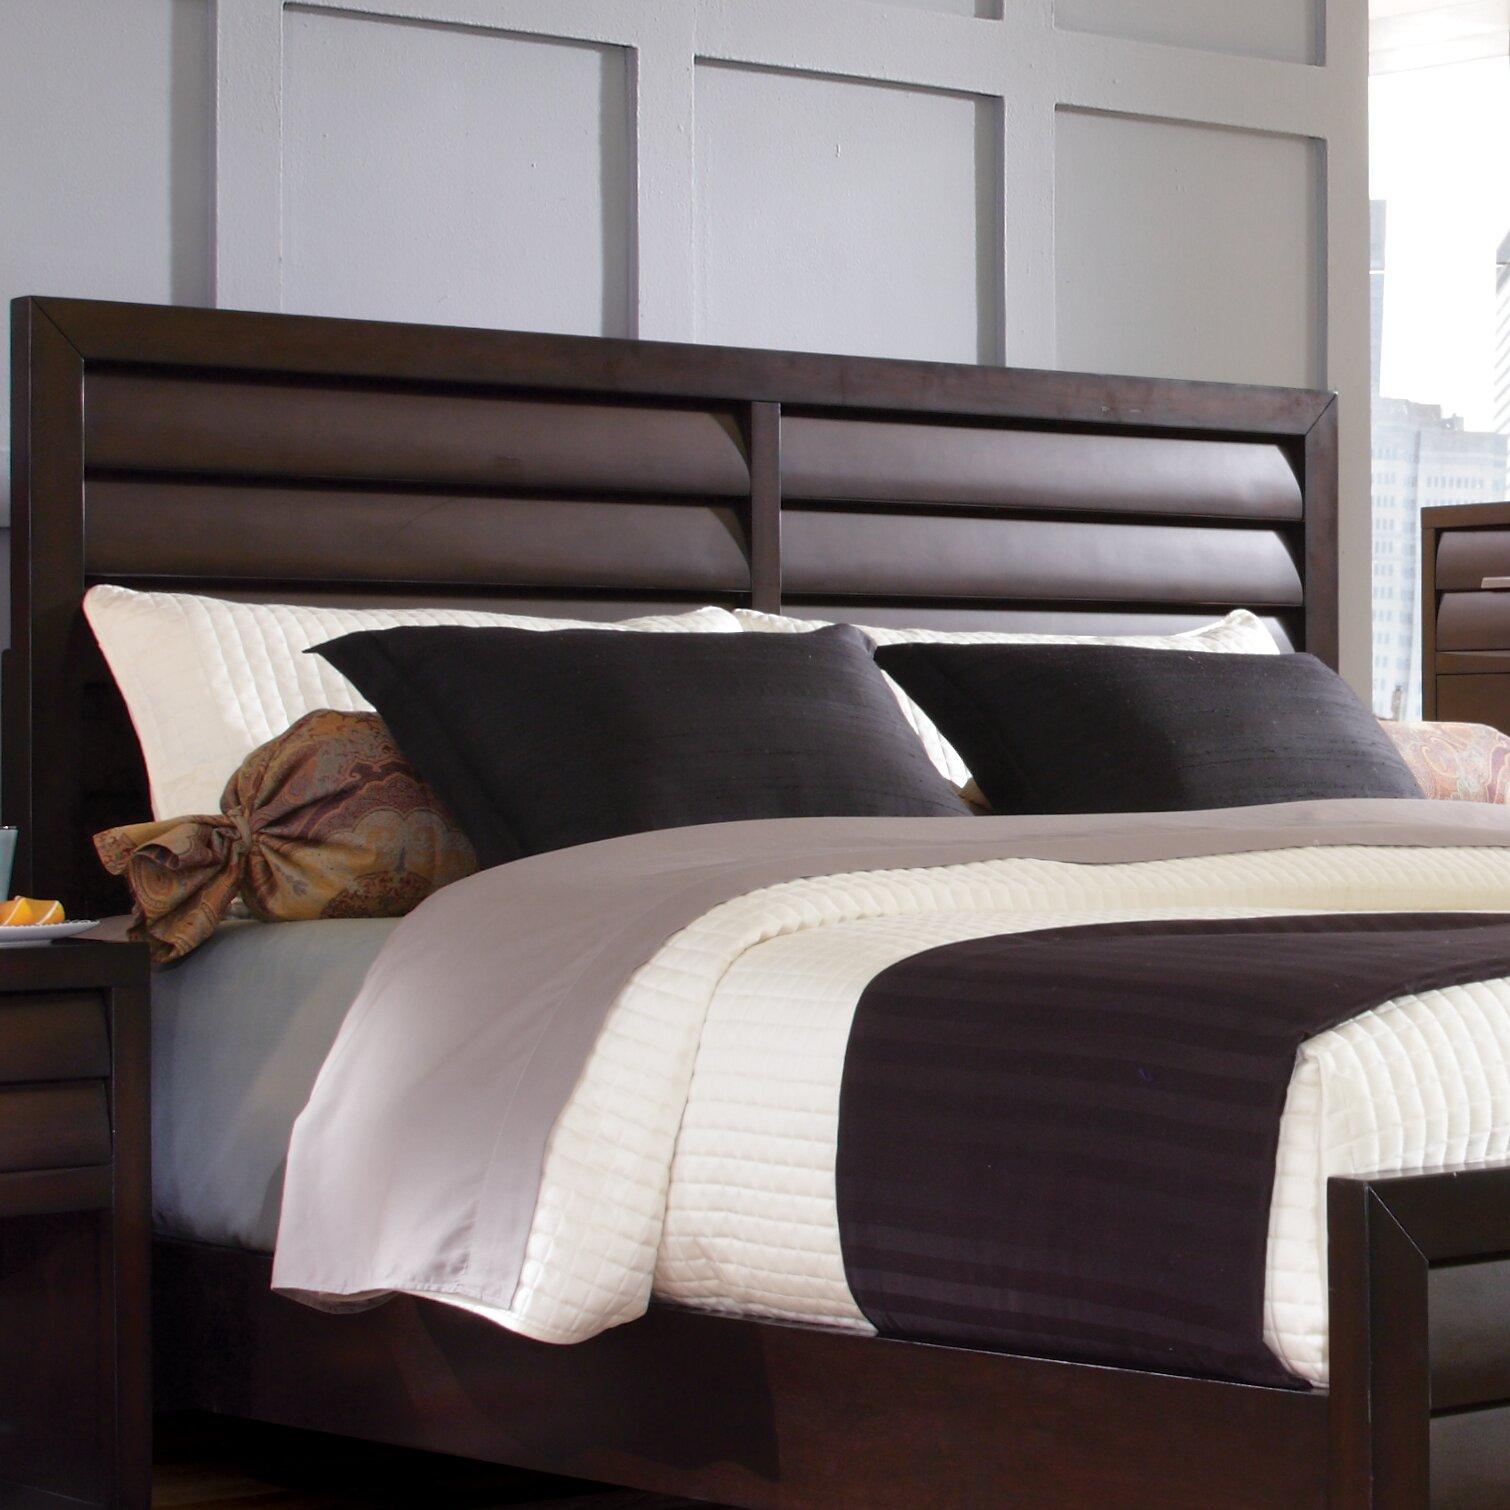 1085 Best Images About Bedroom Furniture On Pinterest: Pulaski Tangerine 330 Panel Customizable Bedroom Set